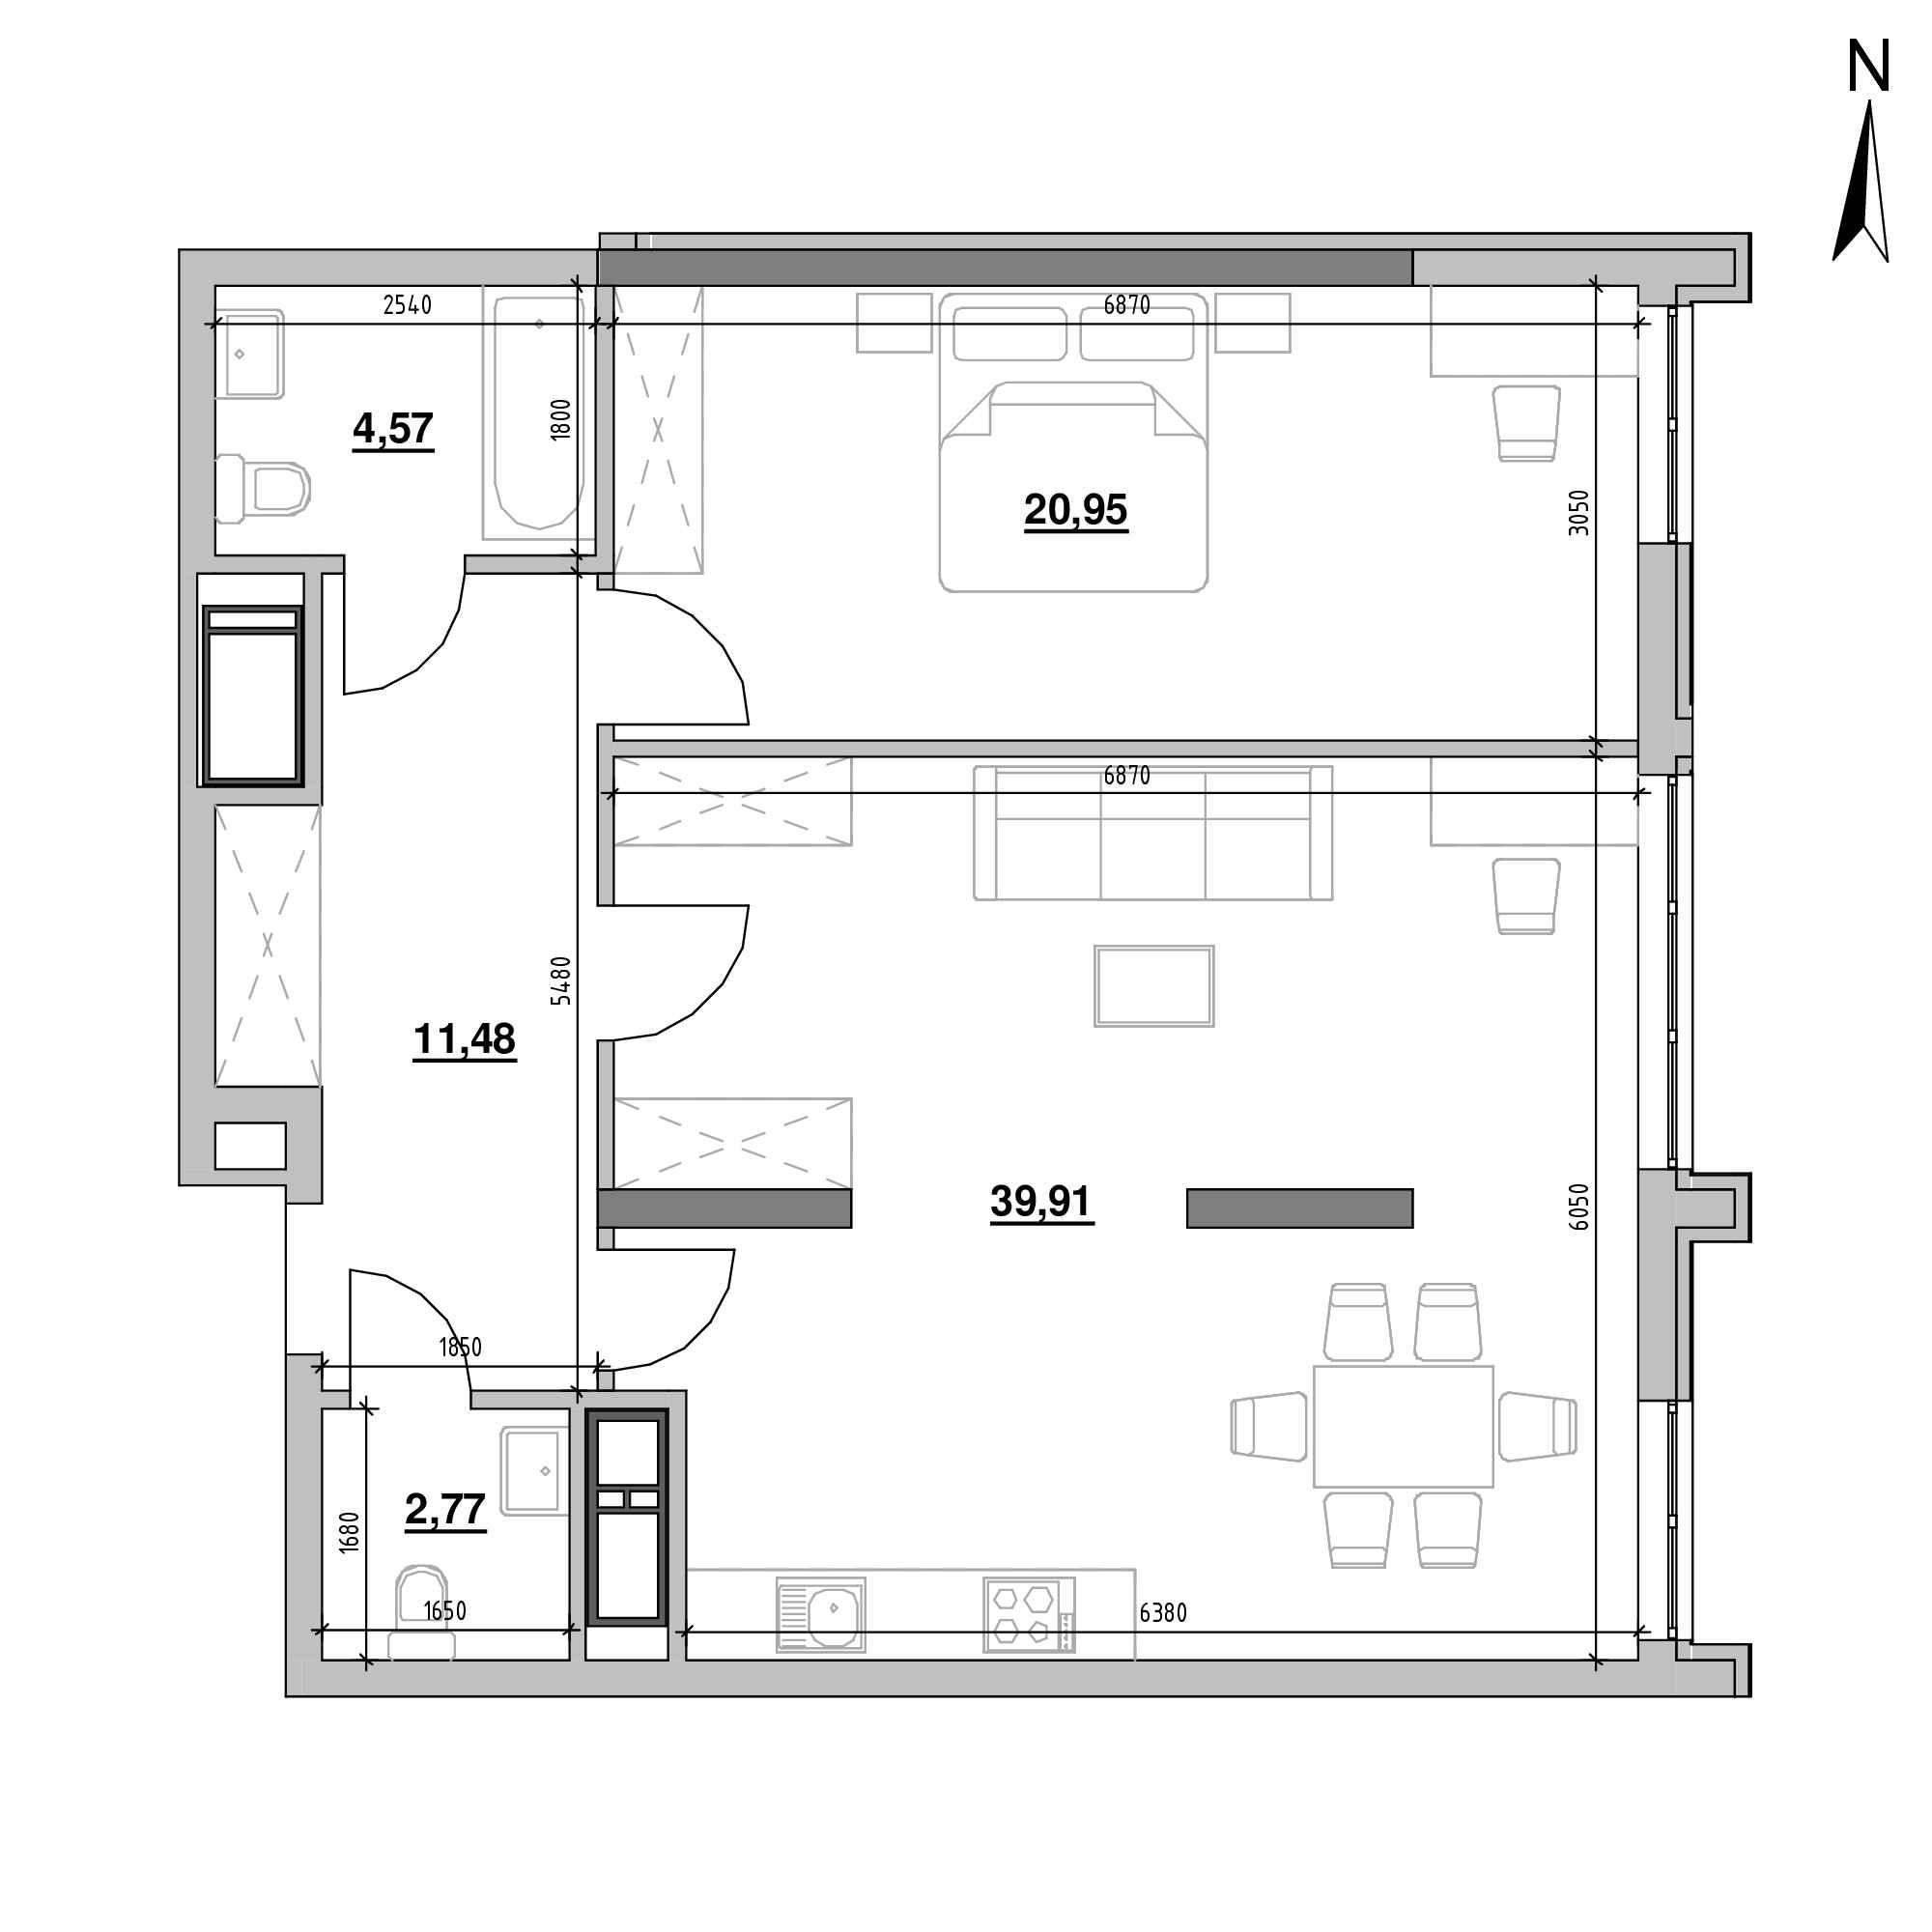 ЖК Nordica Residence: планування 1-кімнатної квартири, №107, 79.68 м<sup>2</sup>